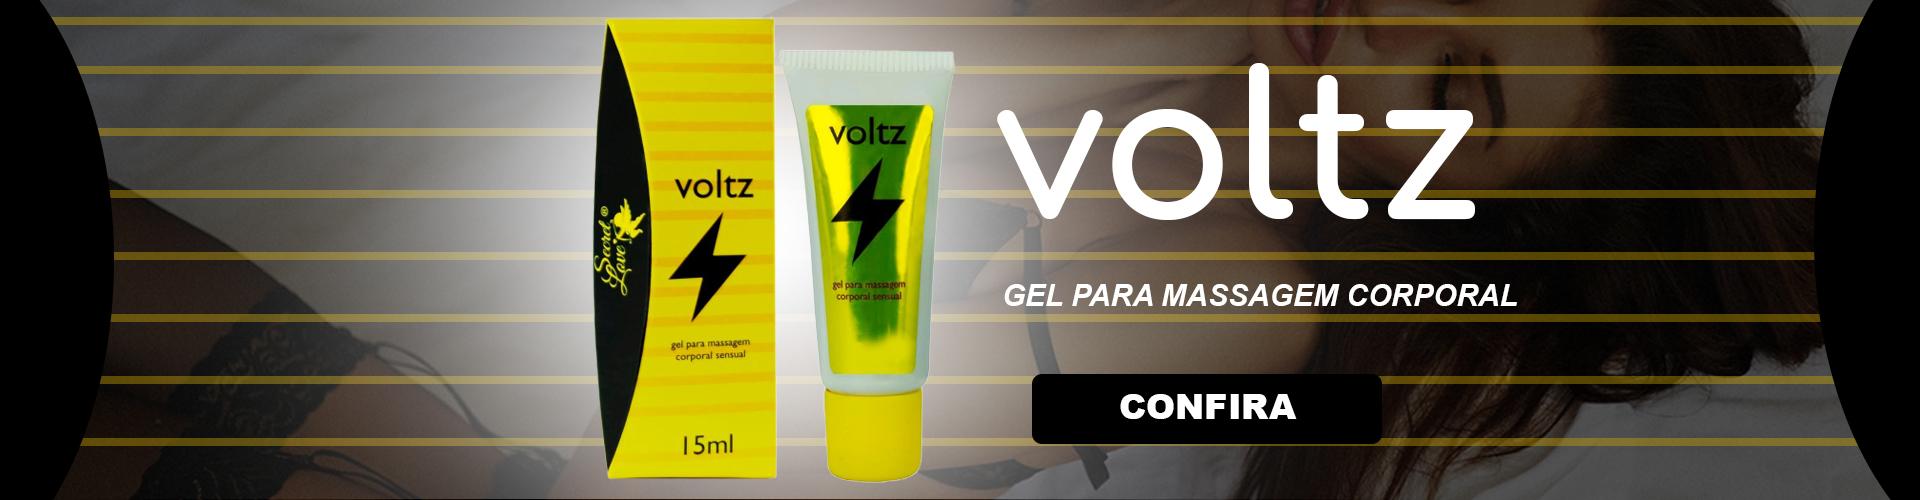 Voltz Gel para massagem corporal